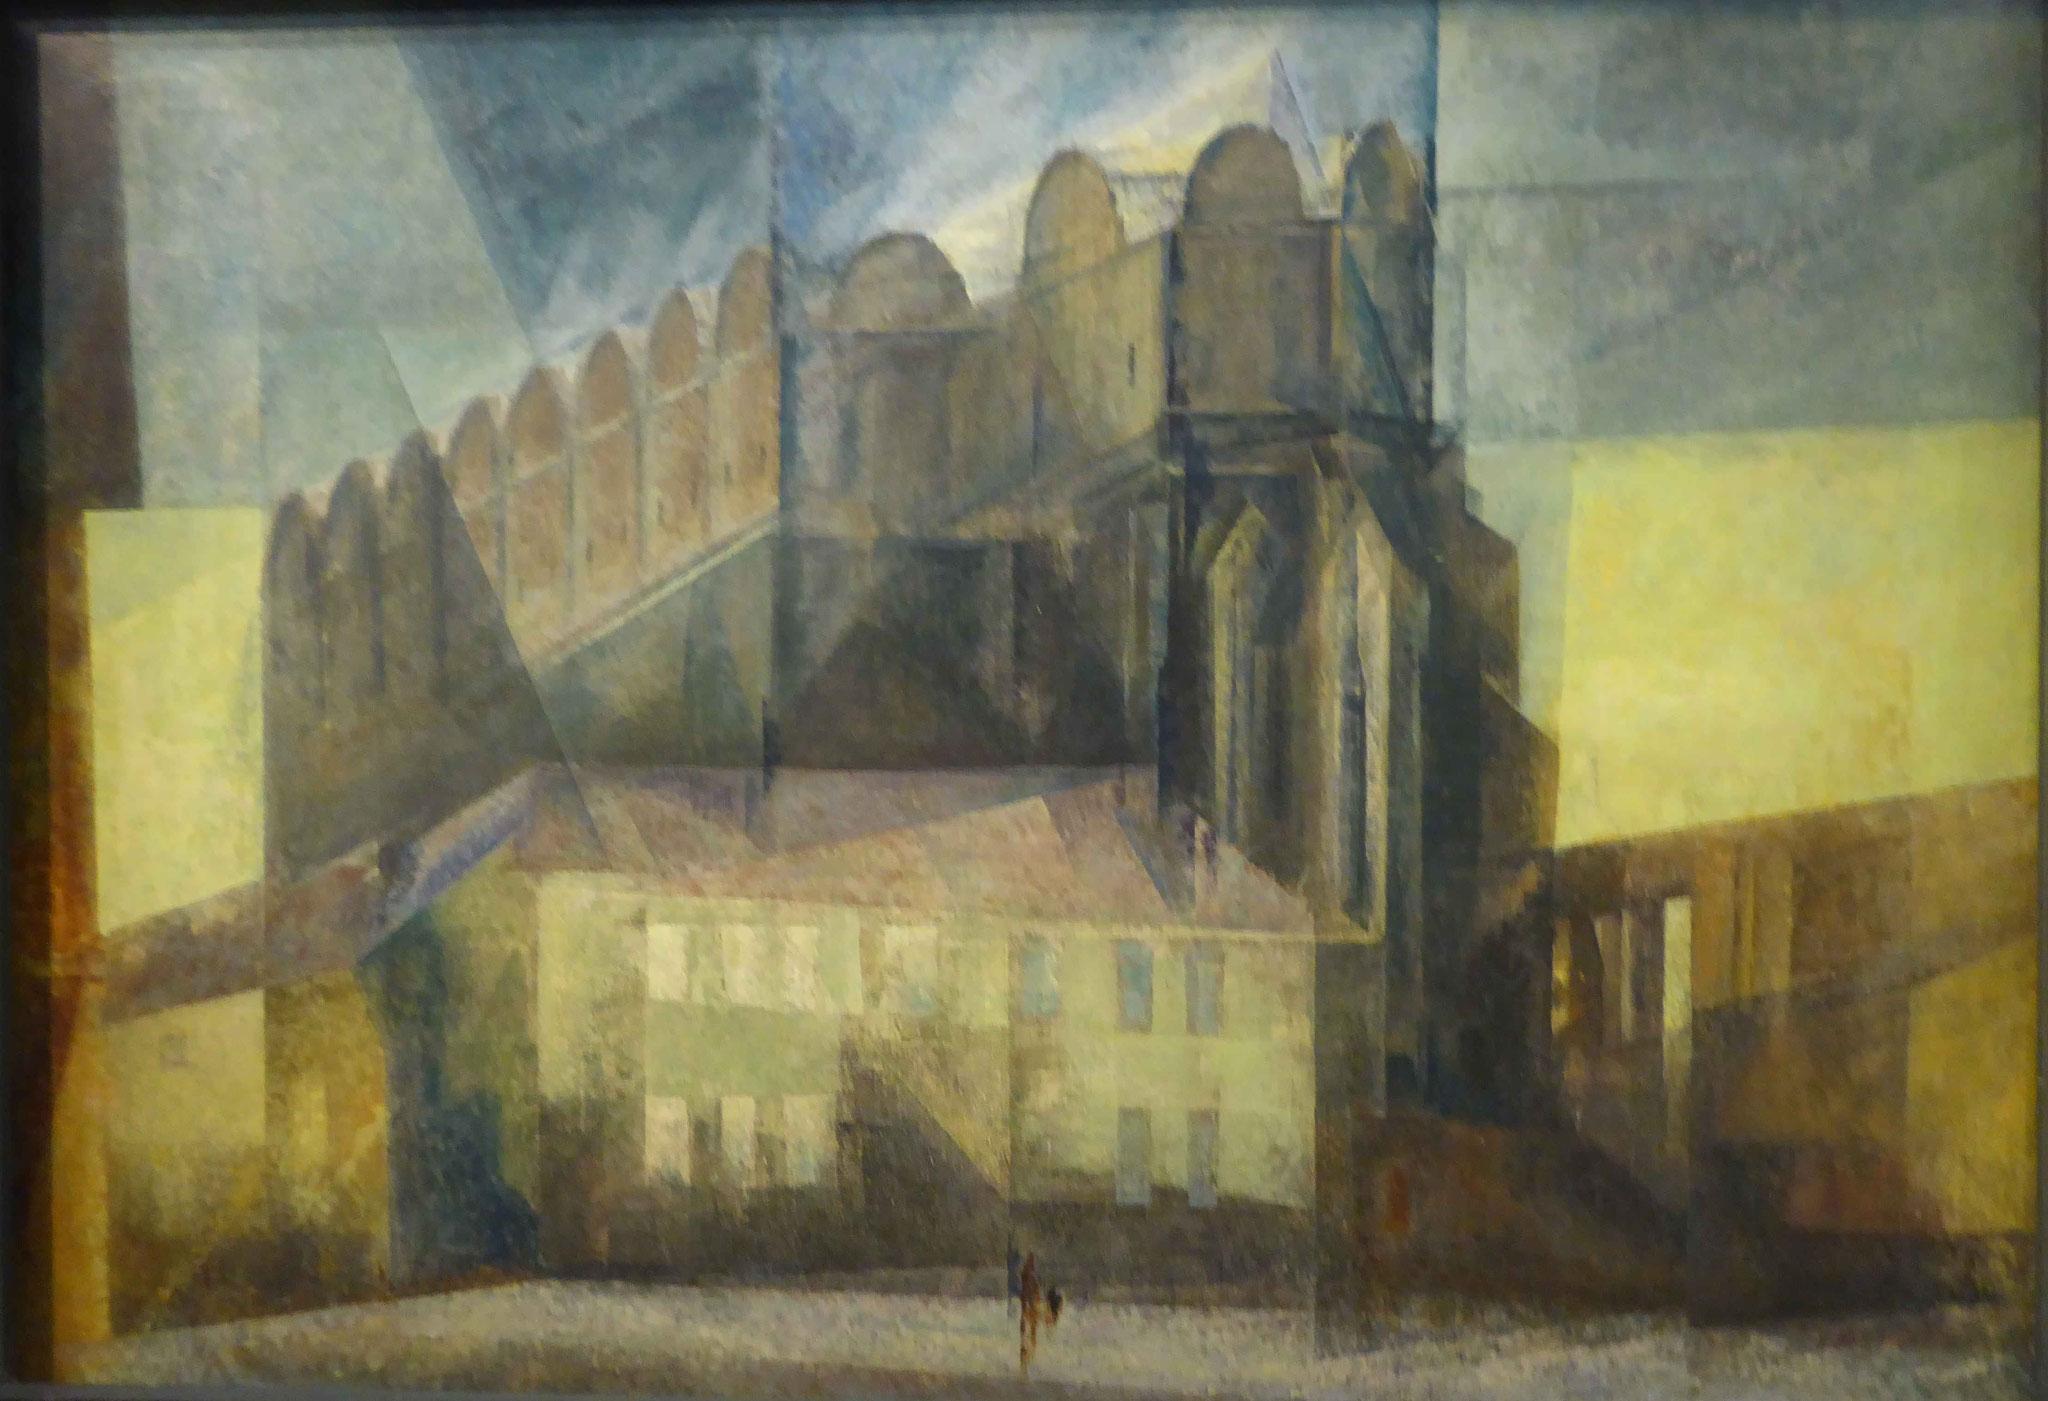 Lyonel Feininger, Der Dom in Halle, 1931,  Museum Moritzburg, Halle